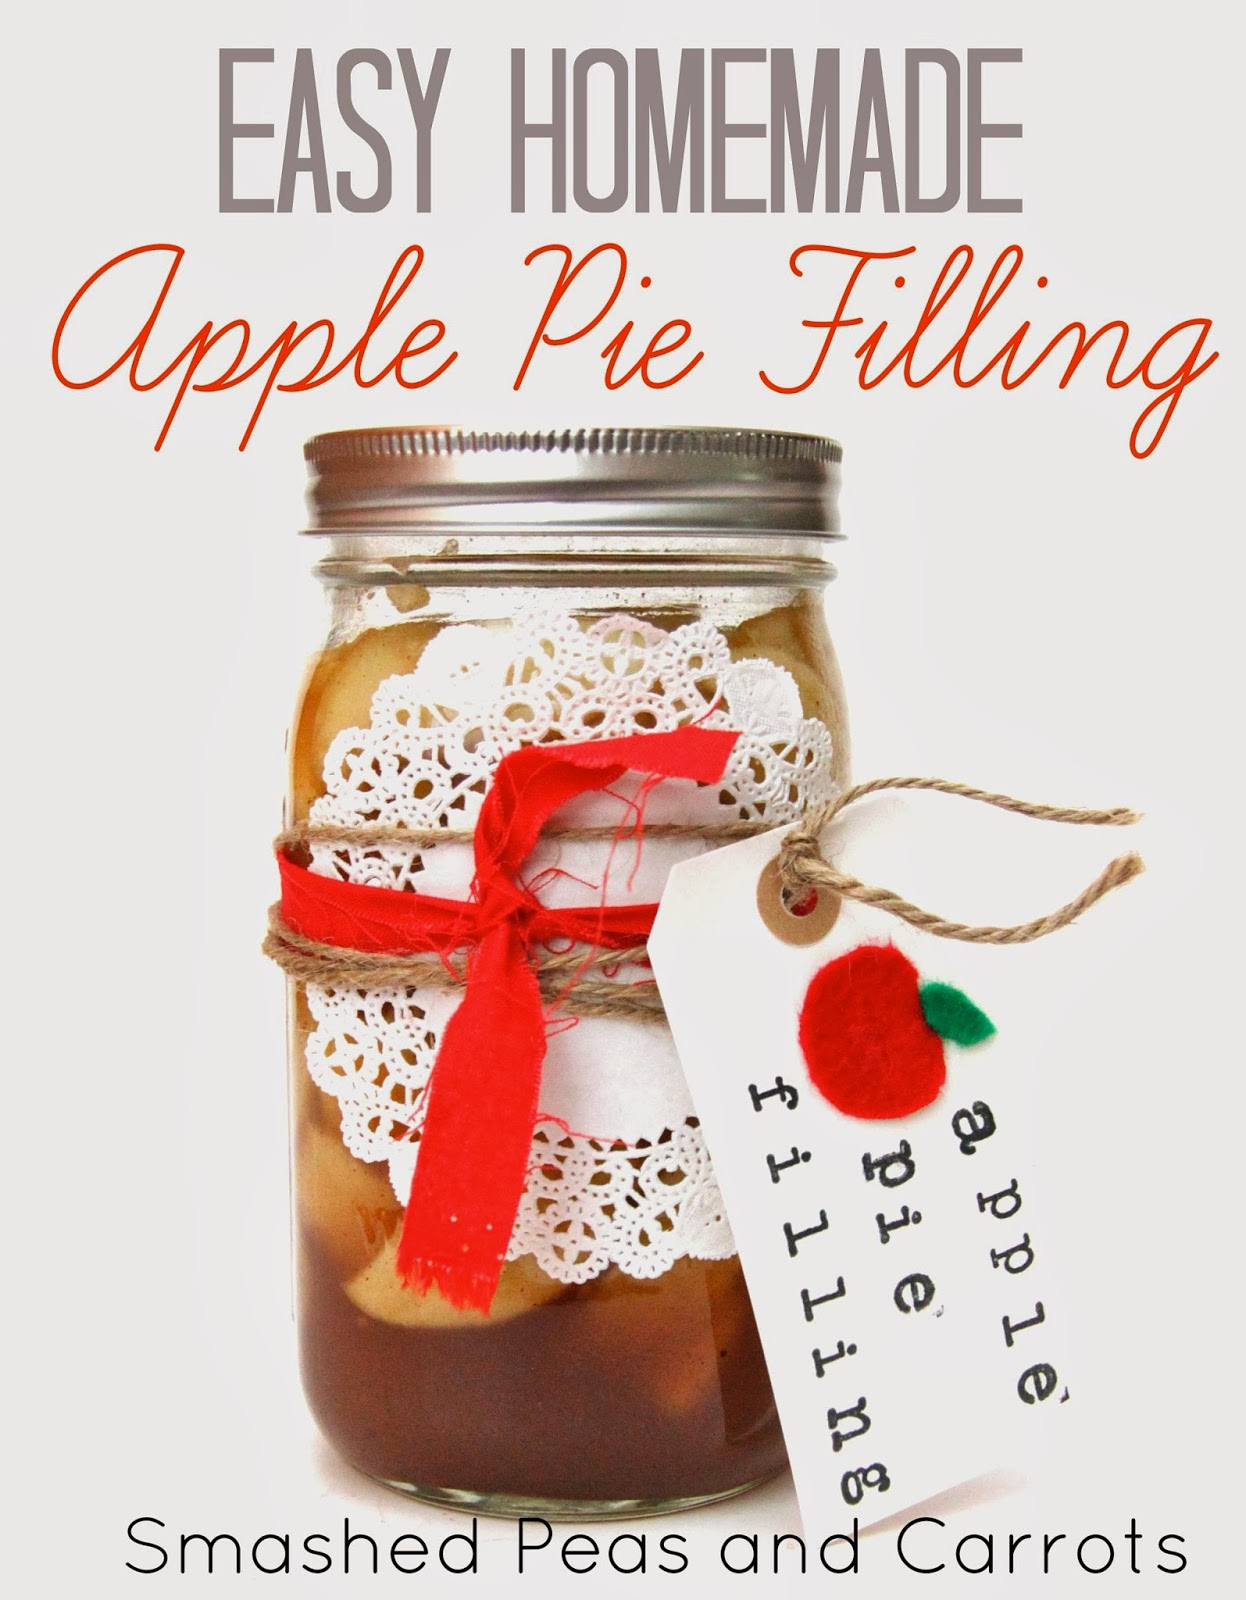 Easy recipes for homemade apple pie